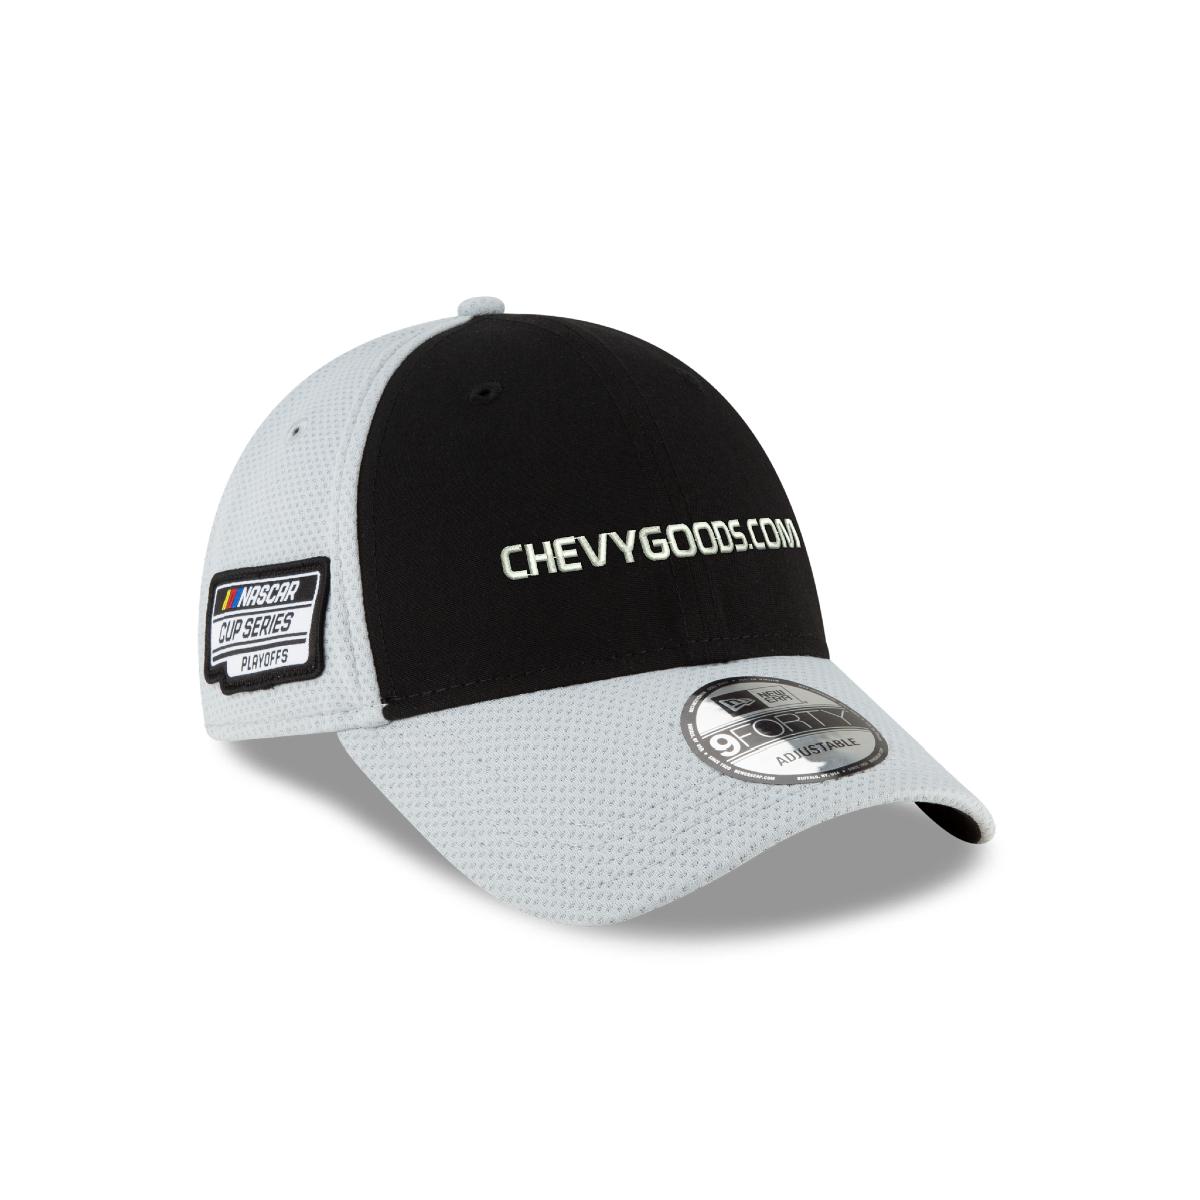 BOWMAN 2020 PLAYOFFS CHEVY GOODS NASCAR CUP HAT